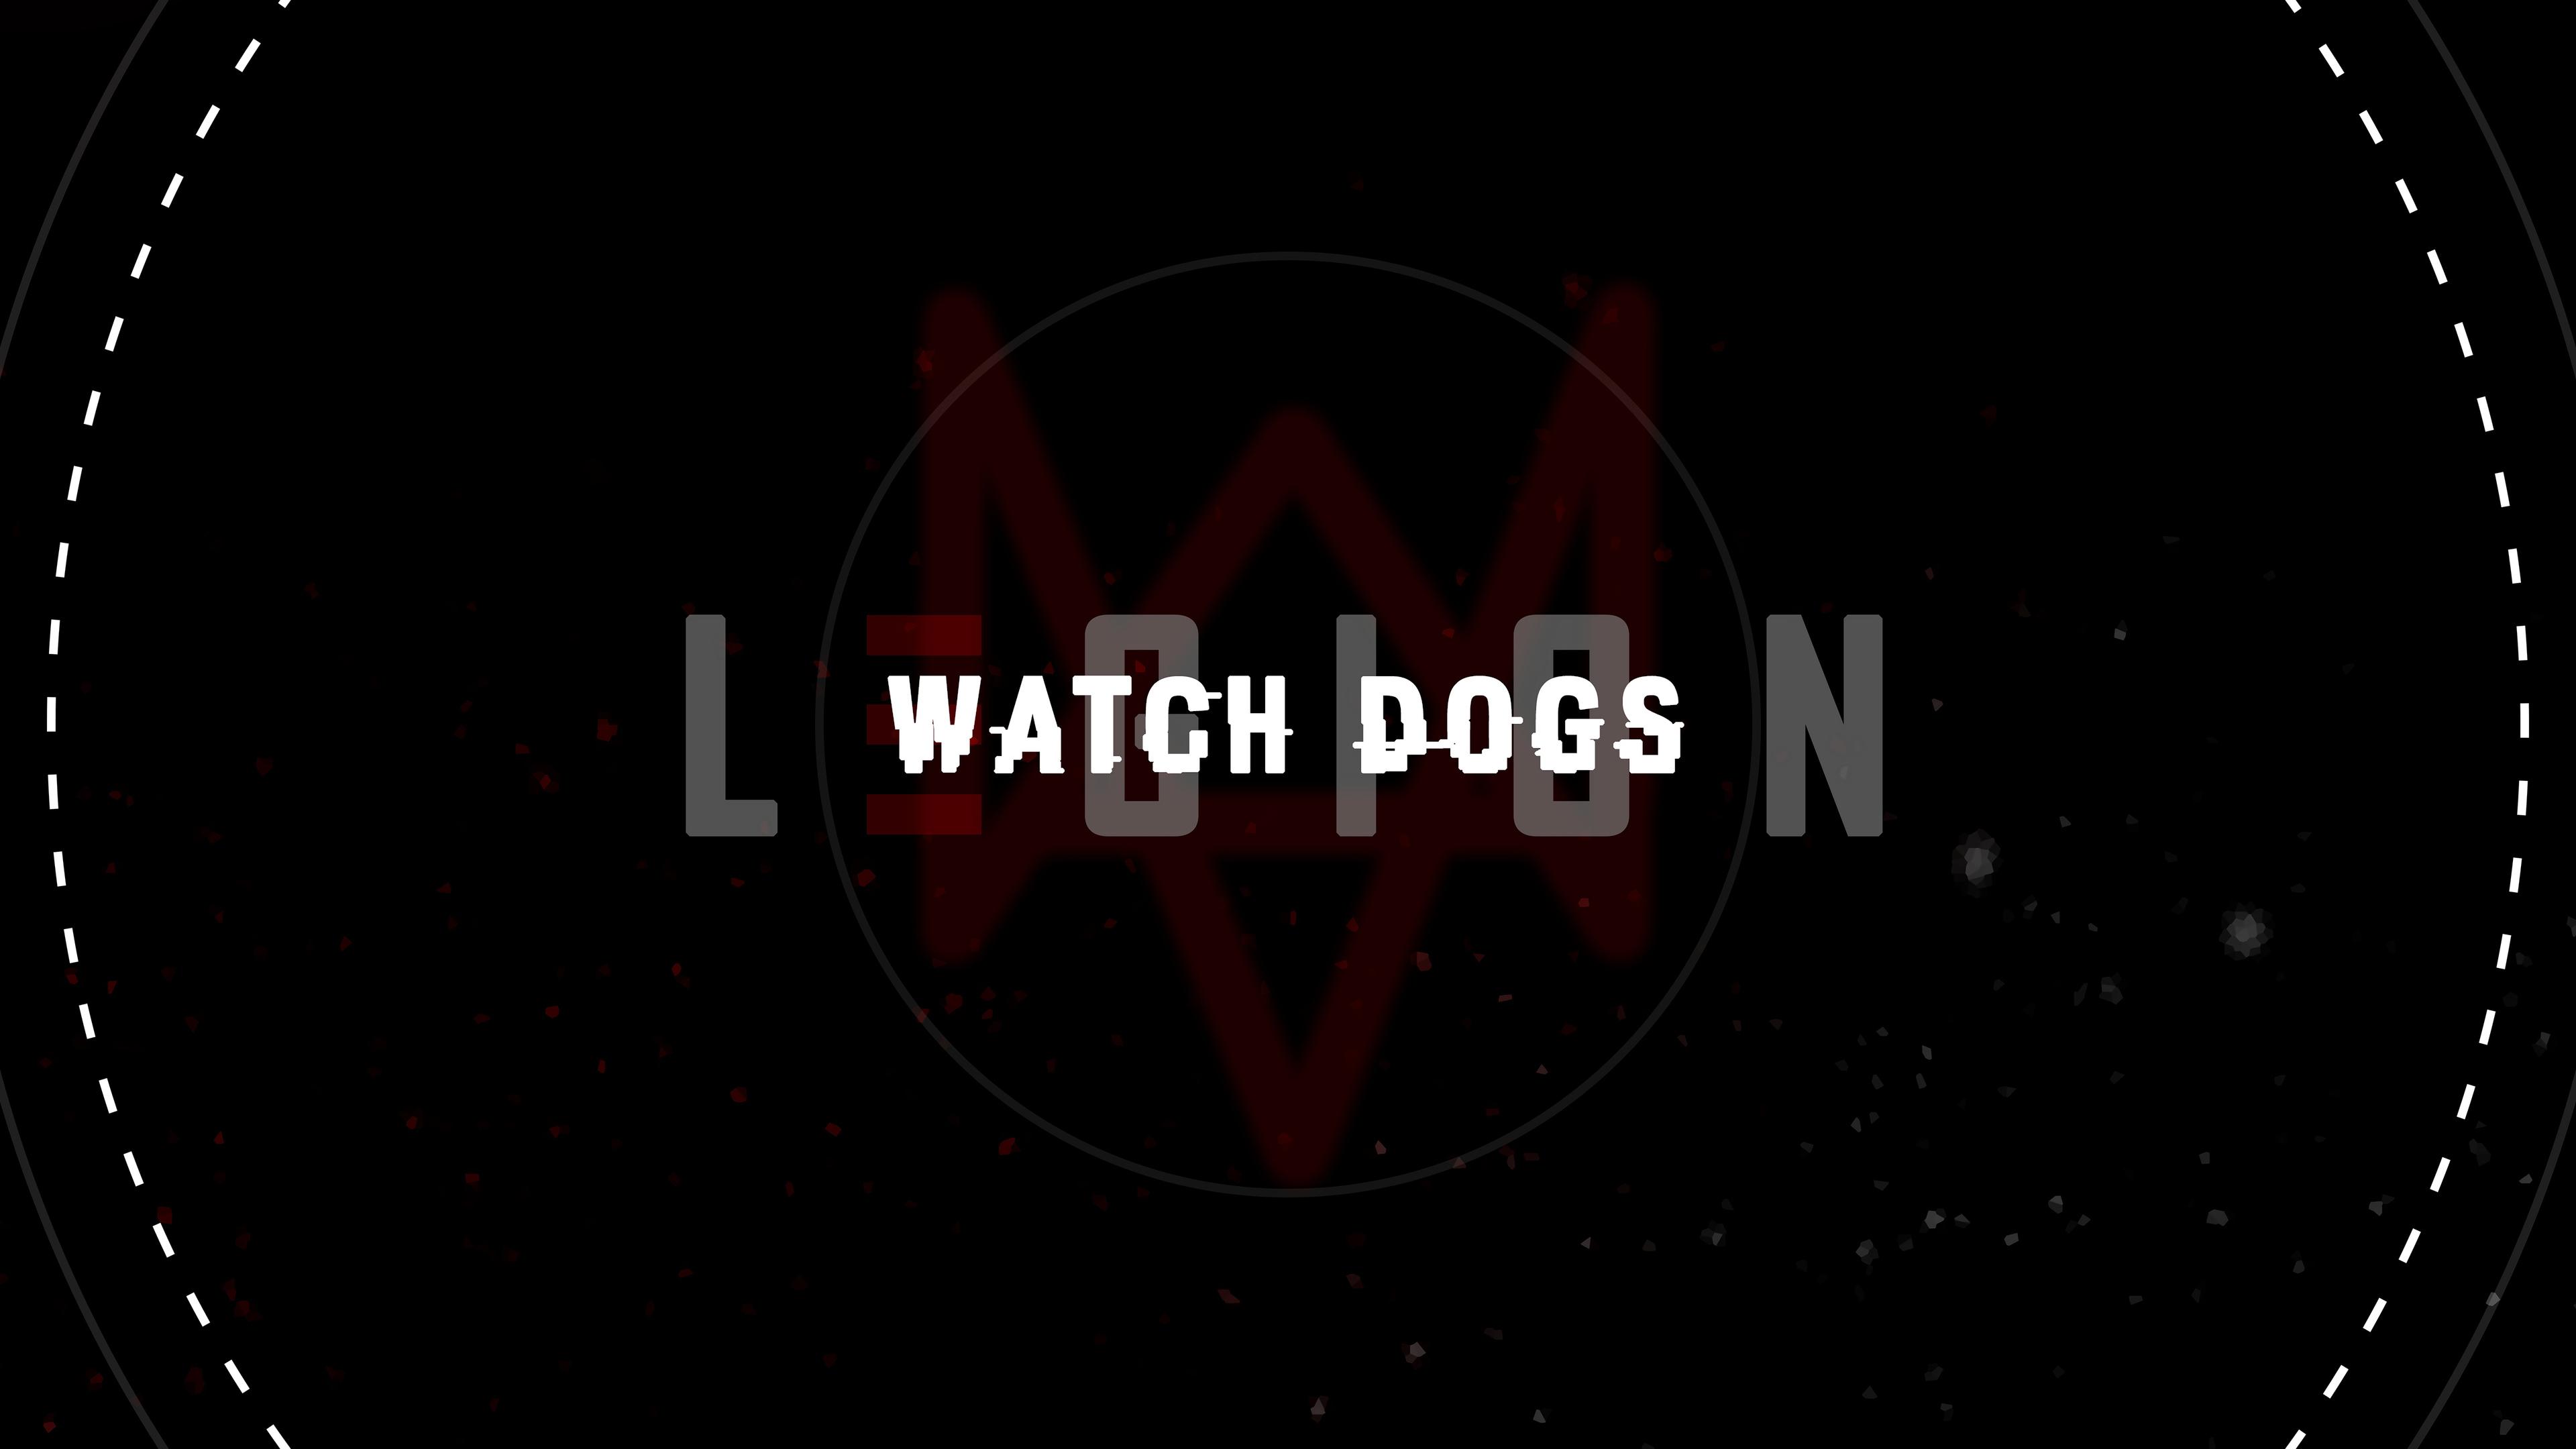 watch dogs legion logo 1570393009 - Watch Dogs Legion Logo - watch dogs wallpapers, watch dogs legion wallpapers, watch dogs 3 wallpapers, hd-wallpapers, games wallpapers, 5k wallpapers, 4k-wallpapers, 2019 games wallpapers